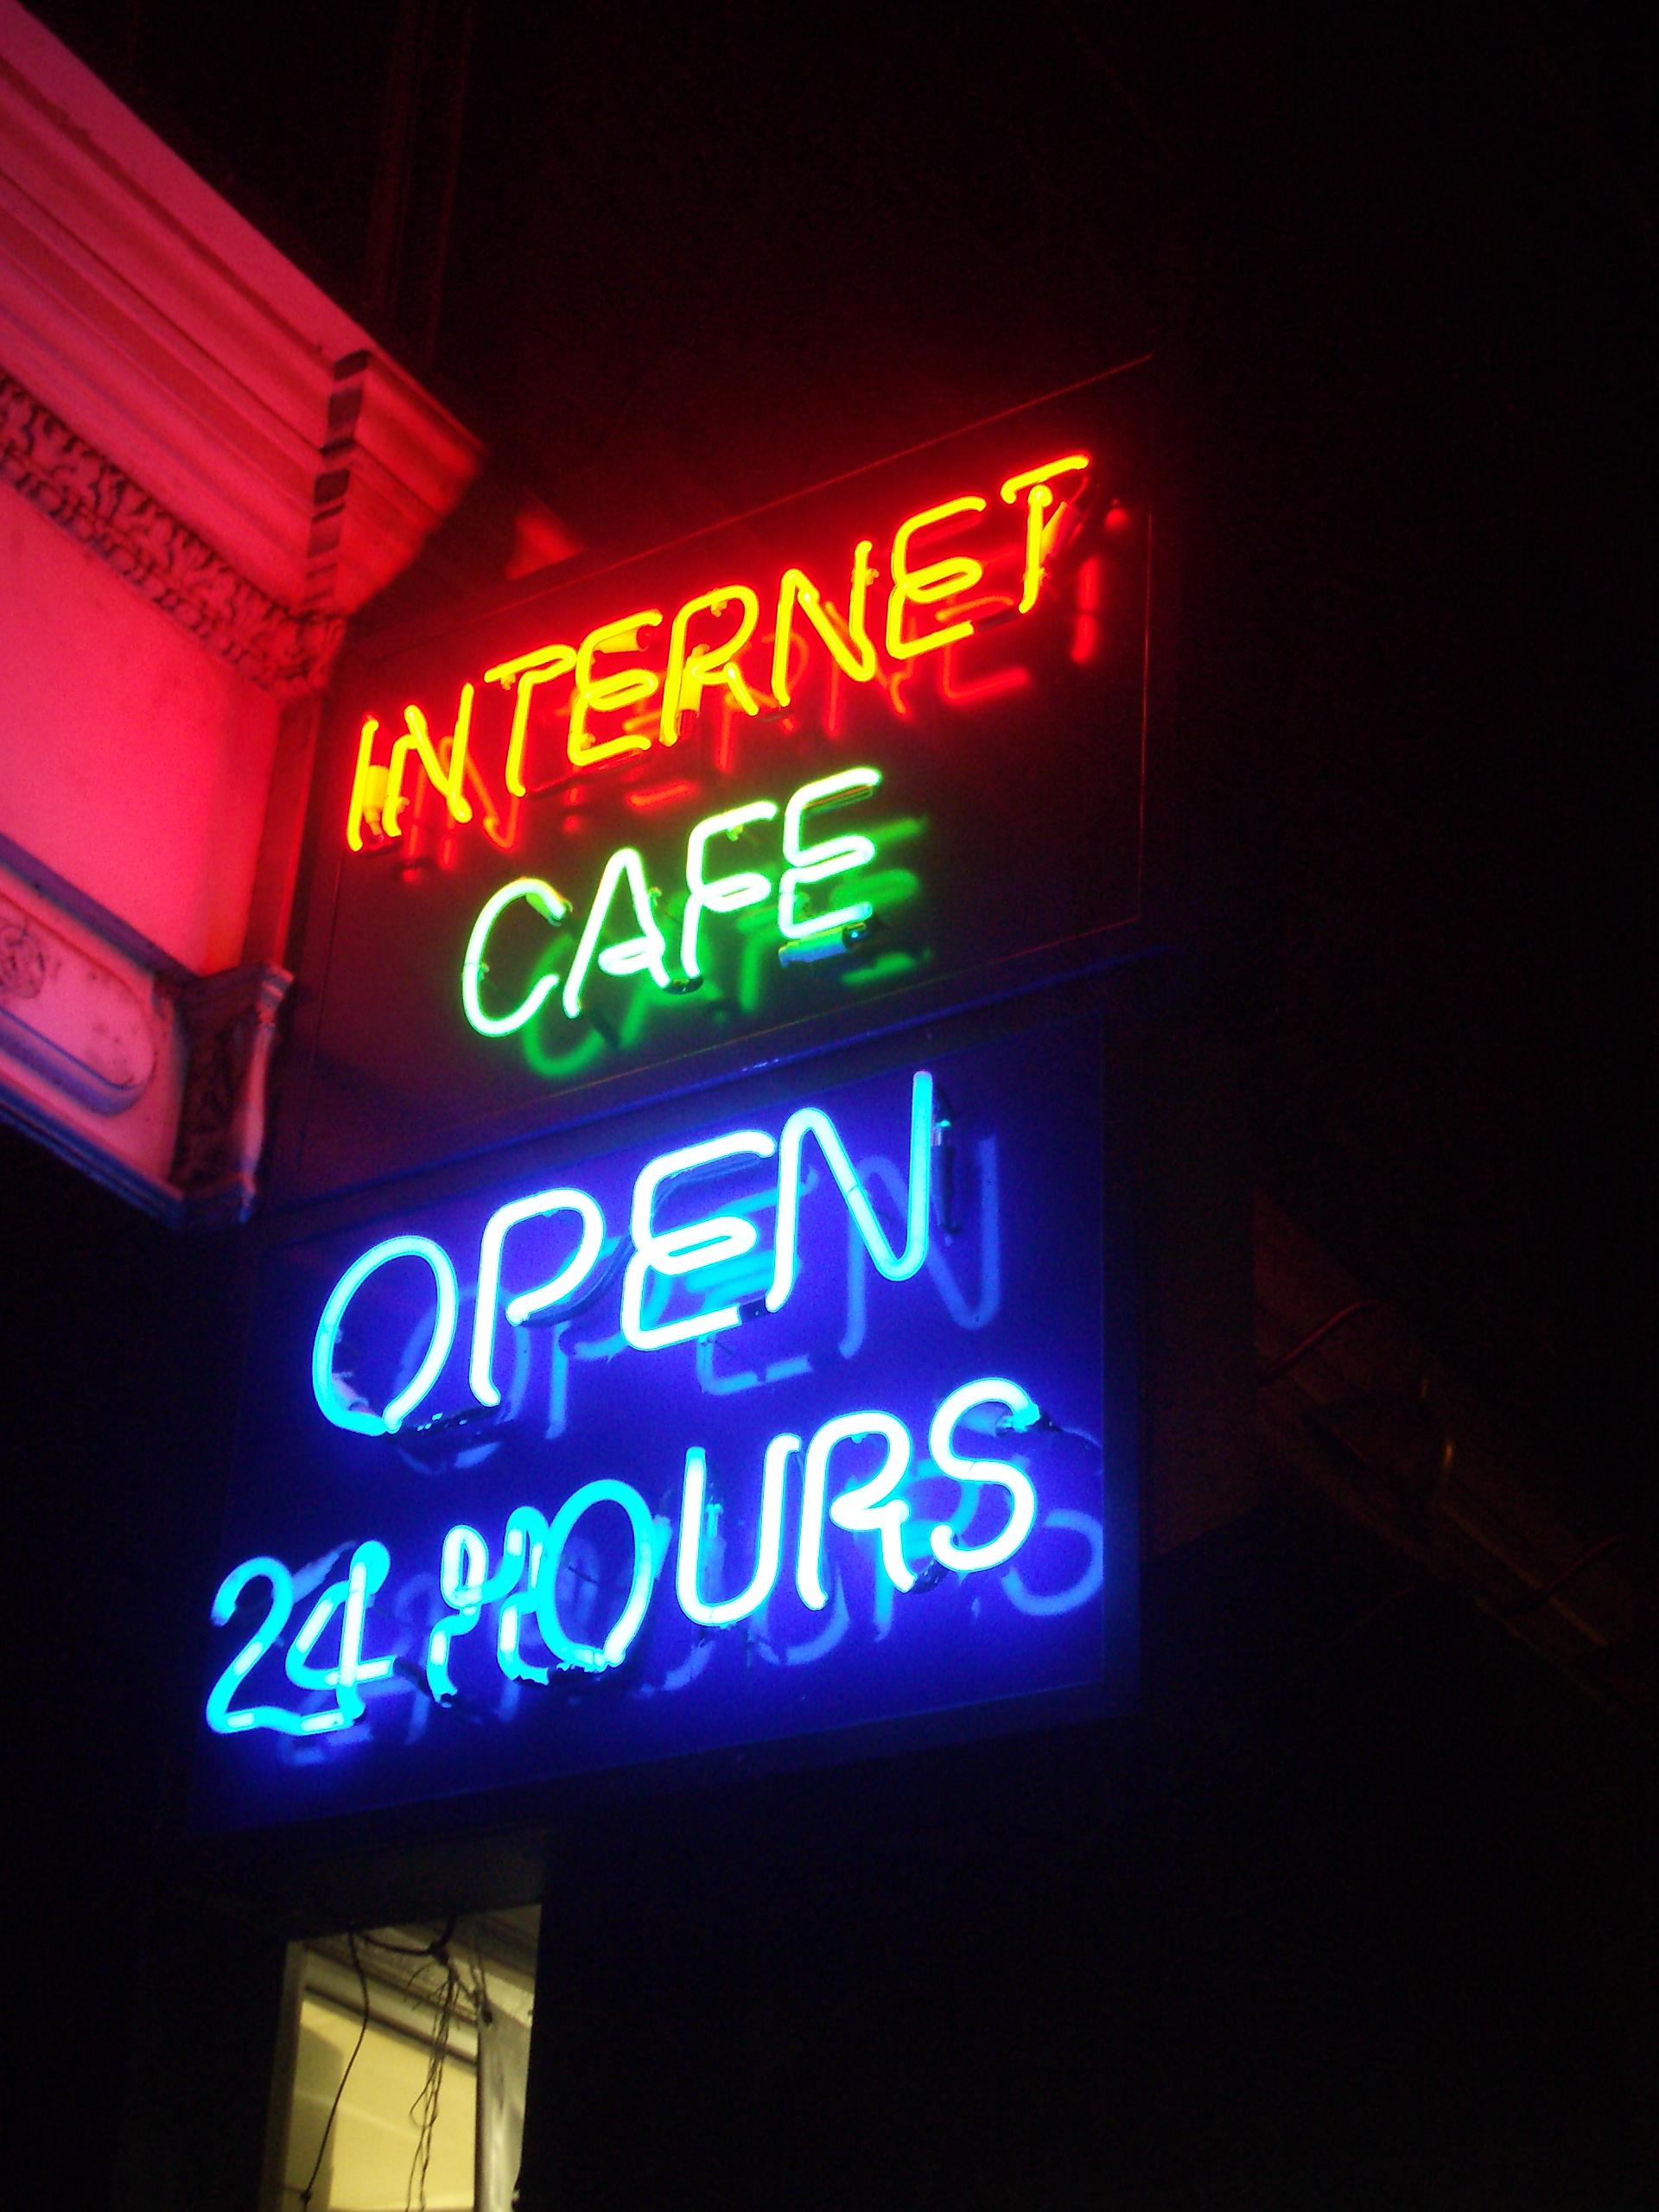 File:Neon Internet Cafe open 24 hours.jpg - Wikimedia Commons